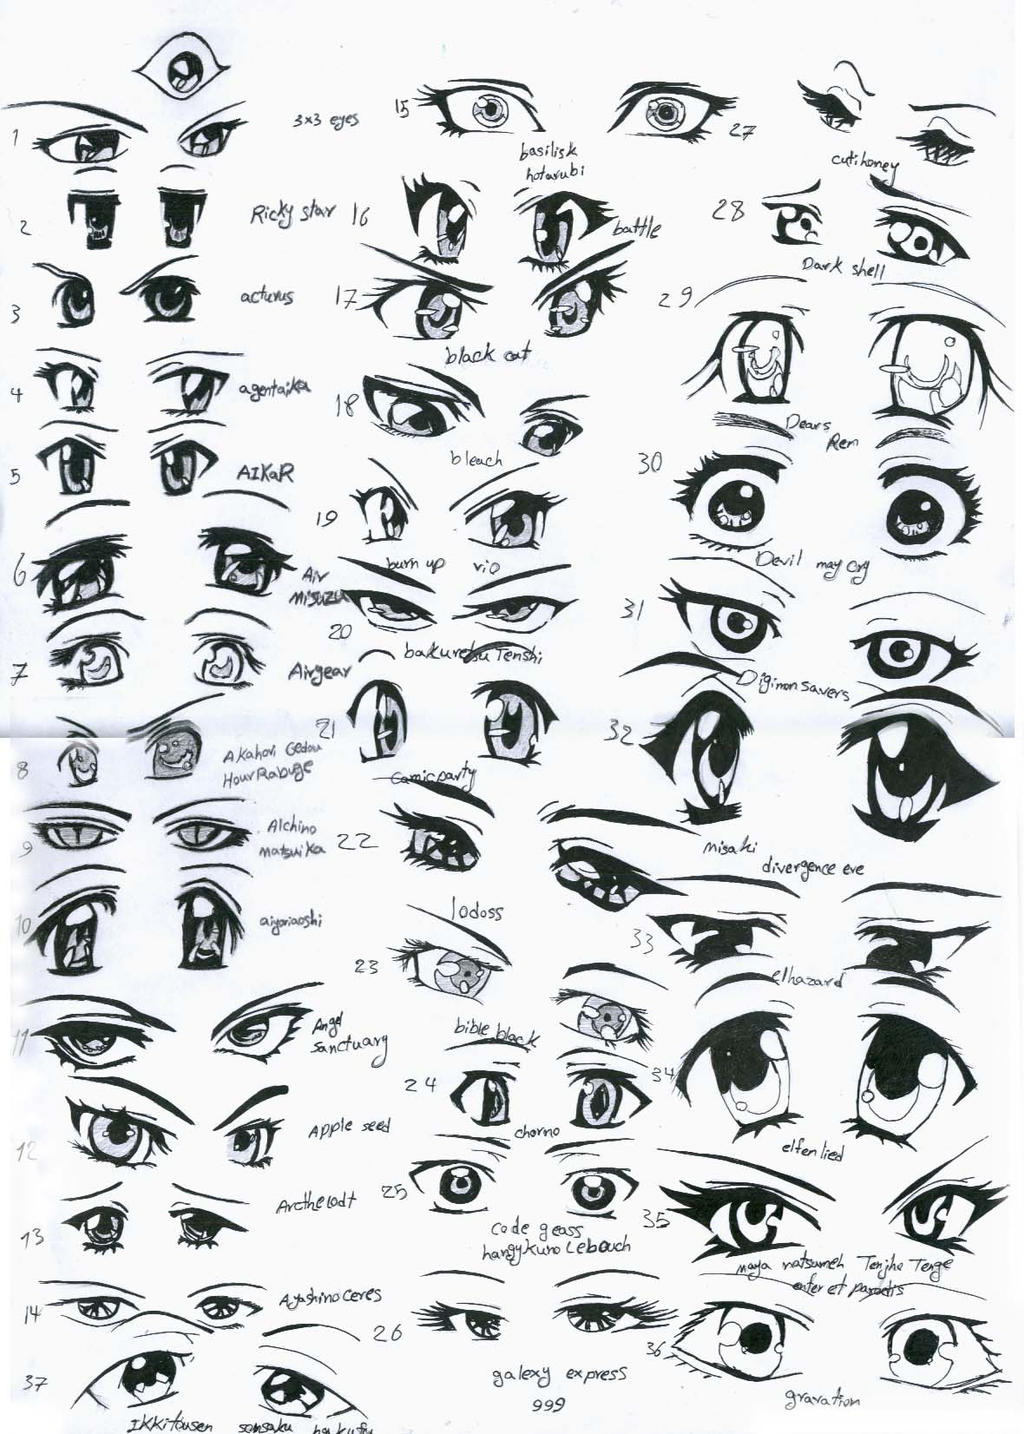 37 female anime eyes by eliantART on DeviantArt